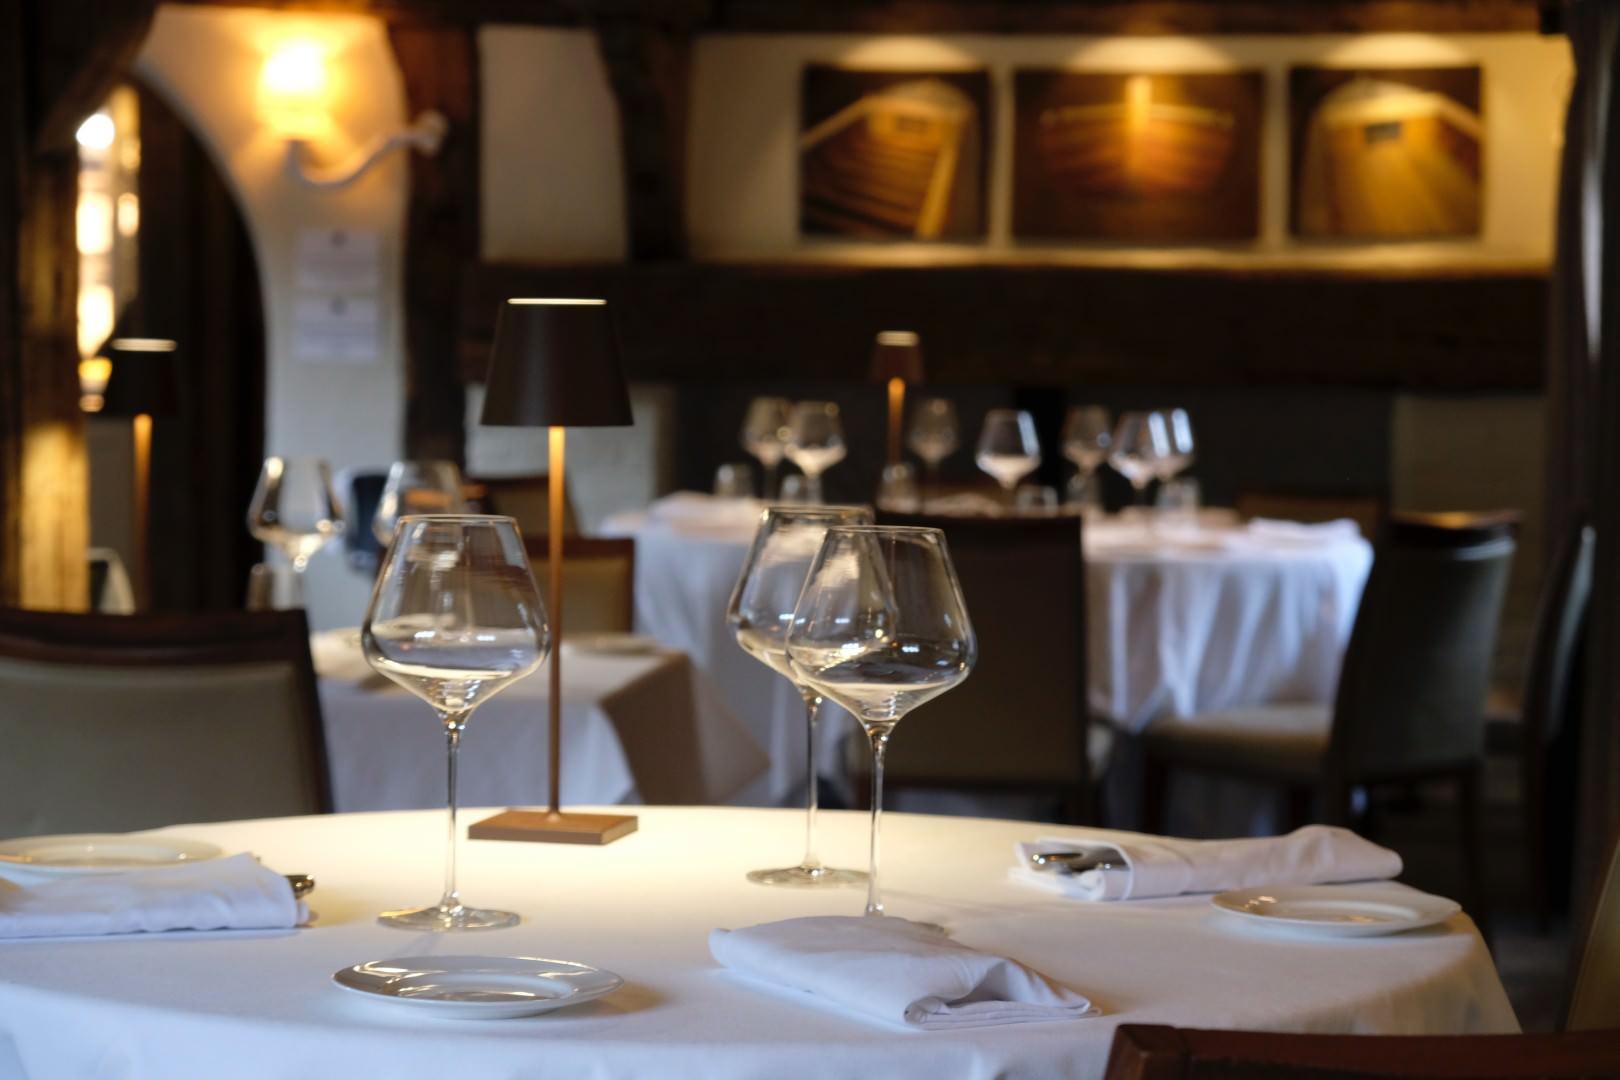 Gourmet Getaway at Maison Talbooth in Dedham